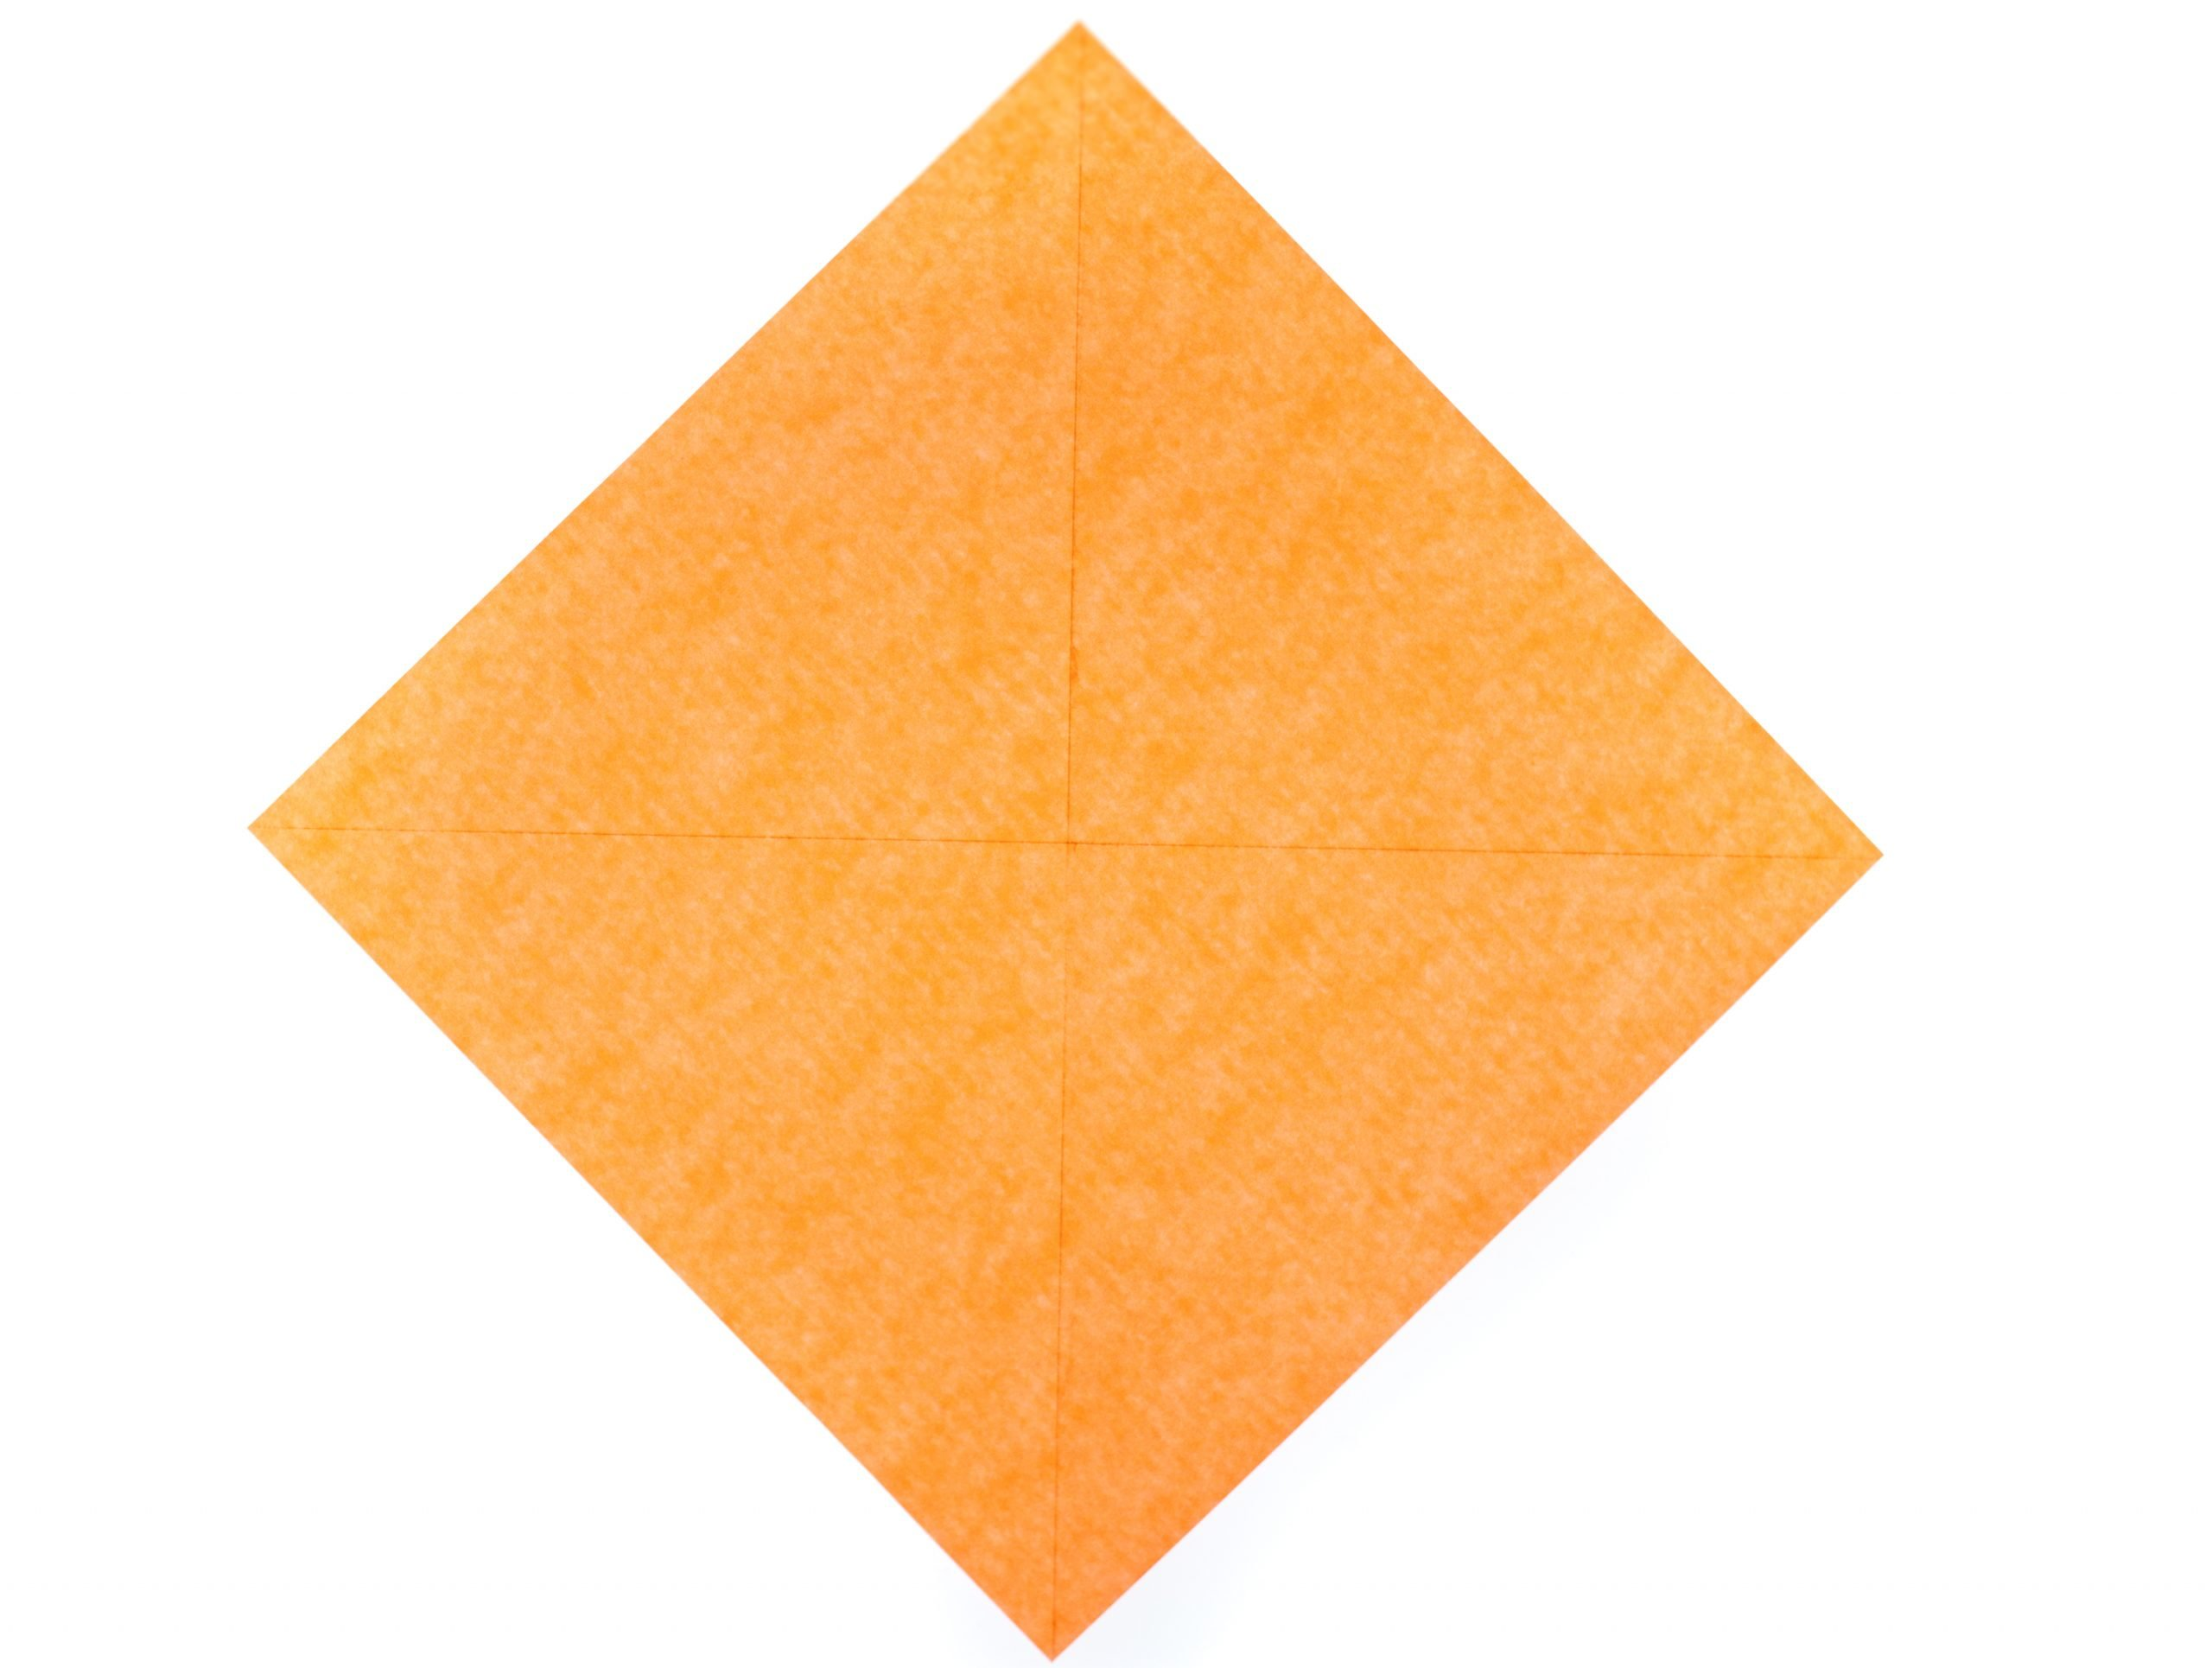 orange translucent paper square with two diagonal creases